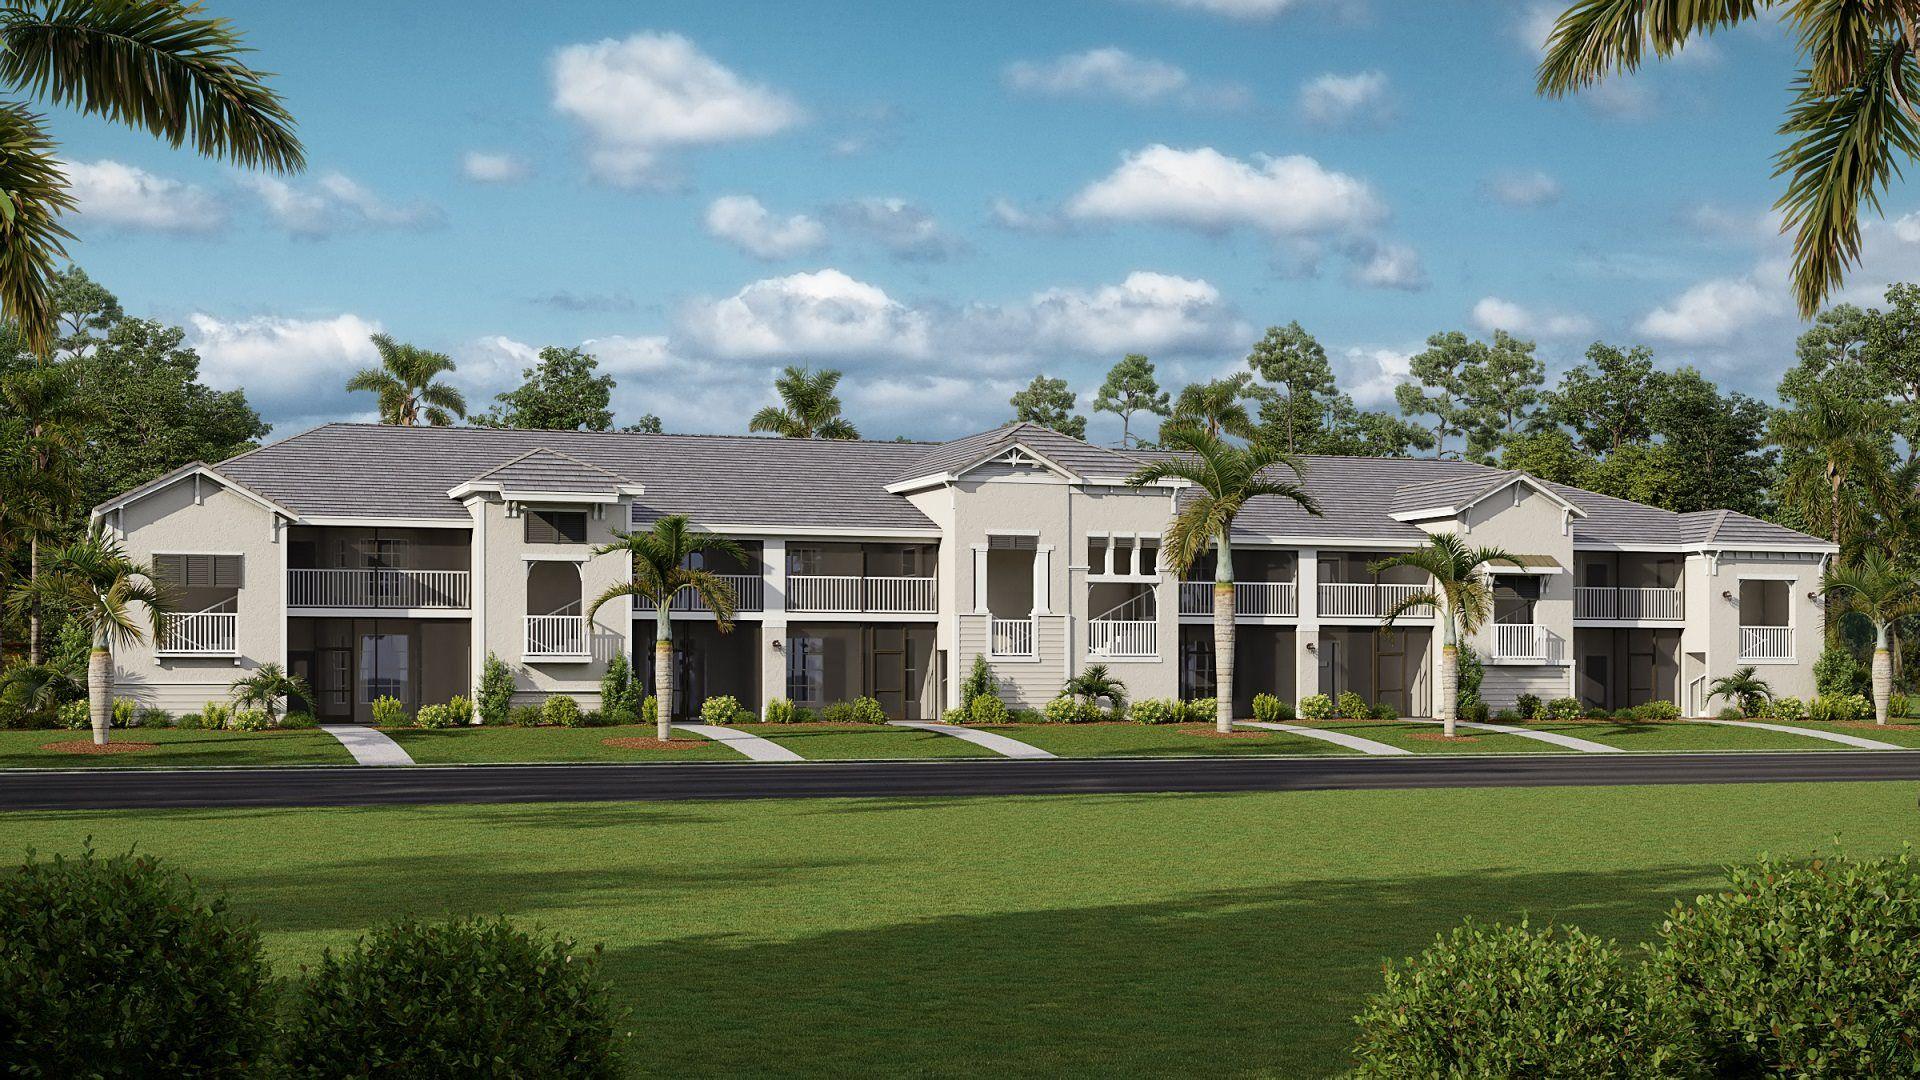 Heritage Landing Veranda Condominiums